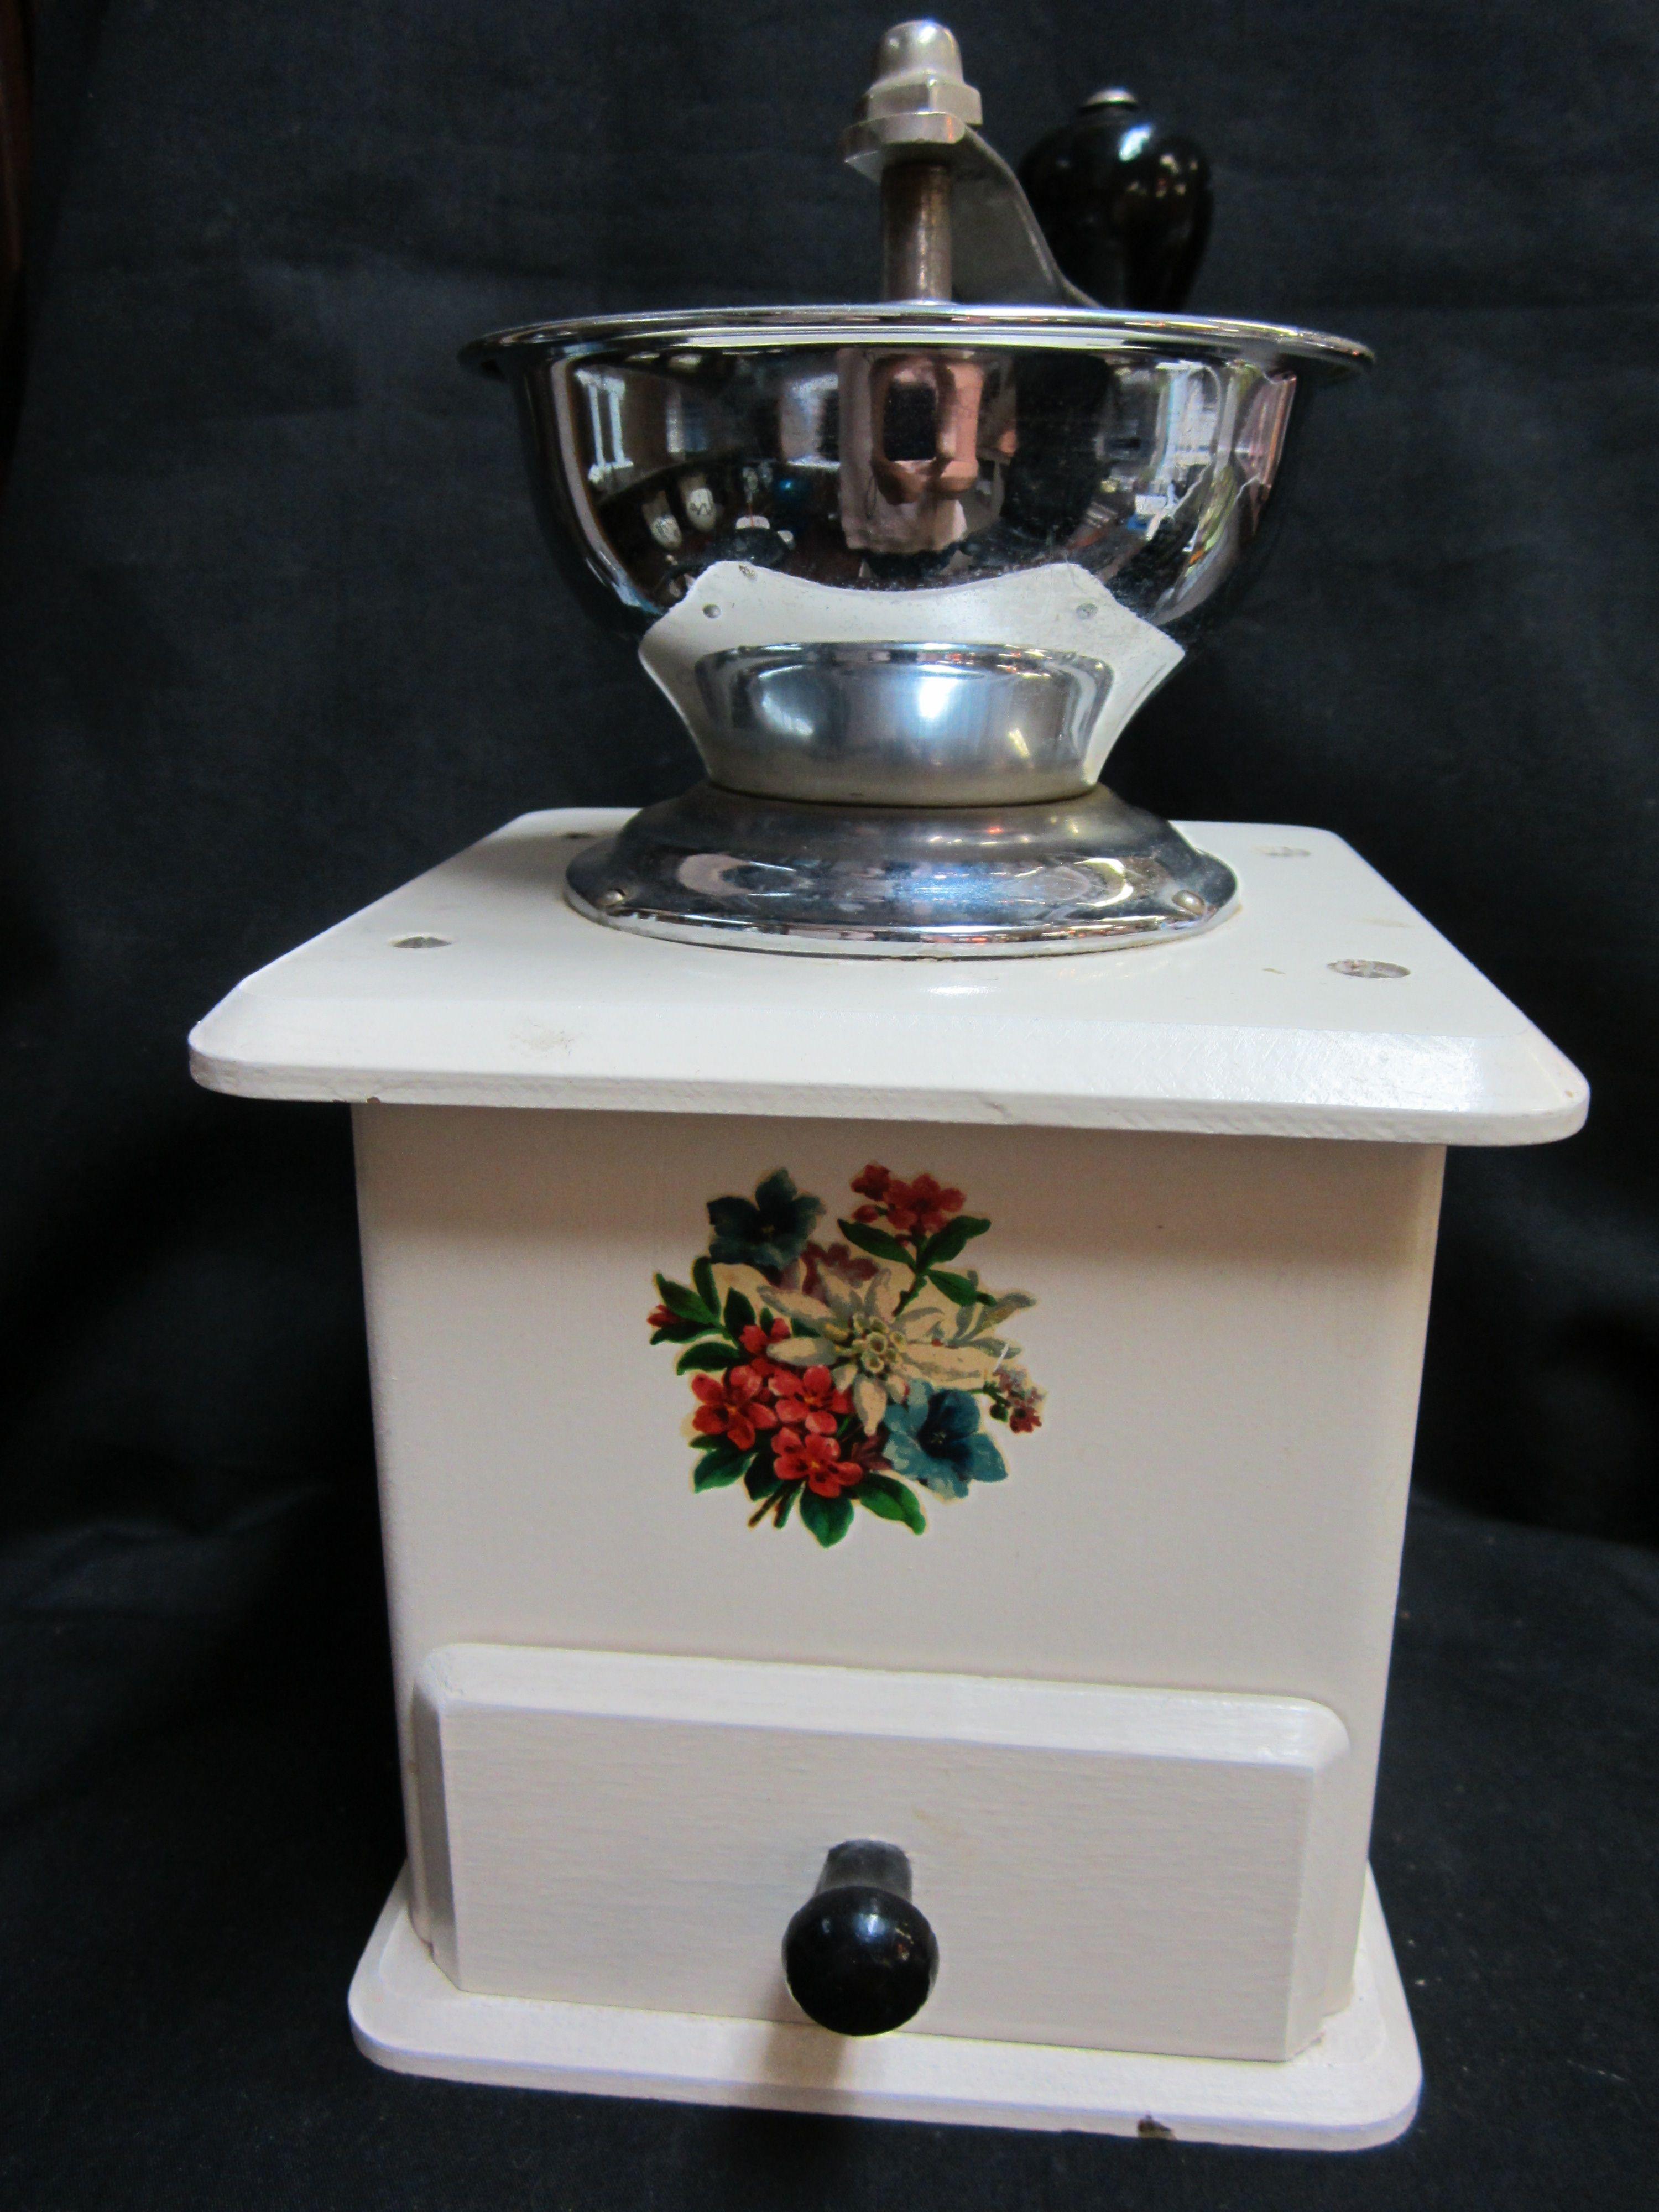 Coffee grindermill made in germany vintage bowls